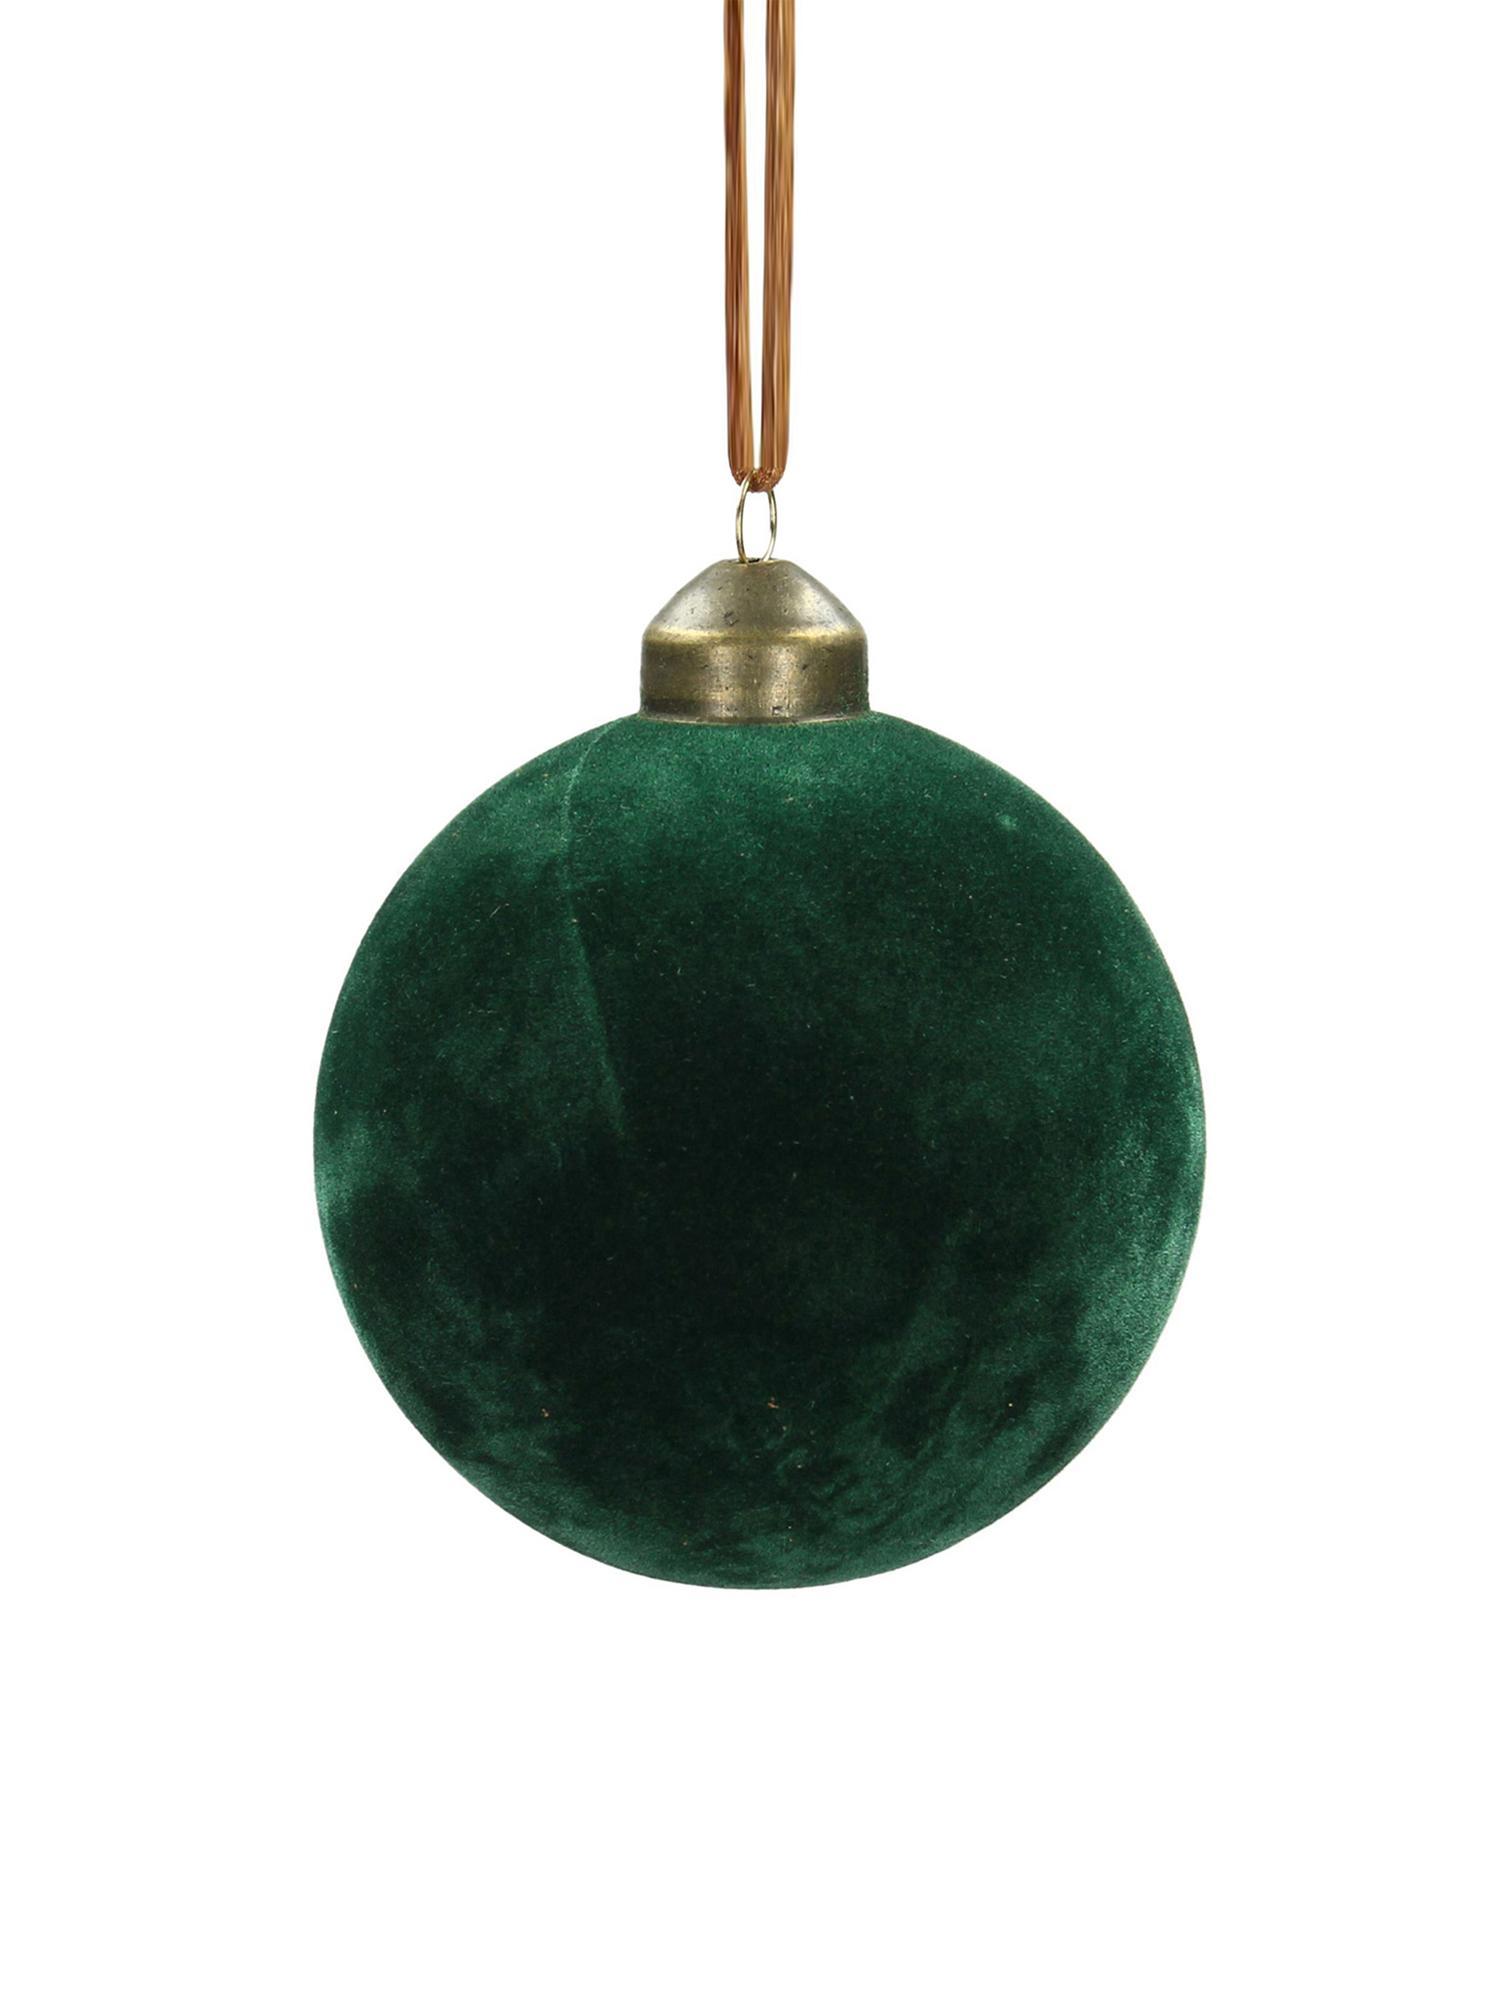 Bolas de Navidad Velvet, Ø8cm, 4uds., Vidrio, terciopelo de poliéster, Verde pino, Ø 8 cm